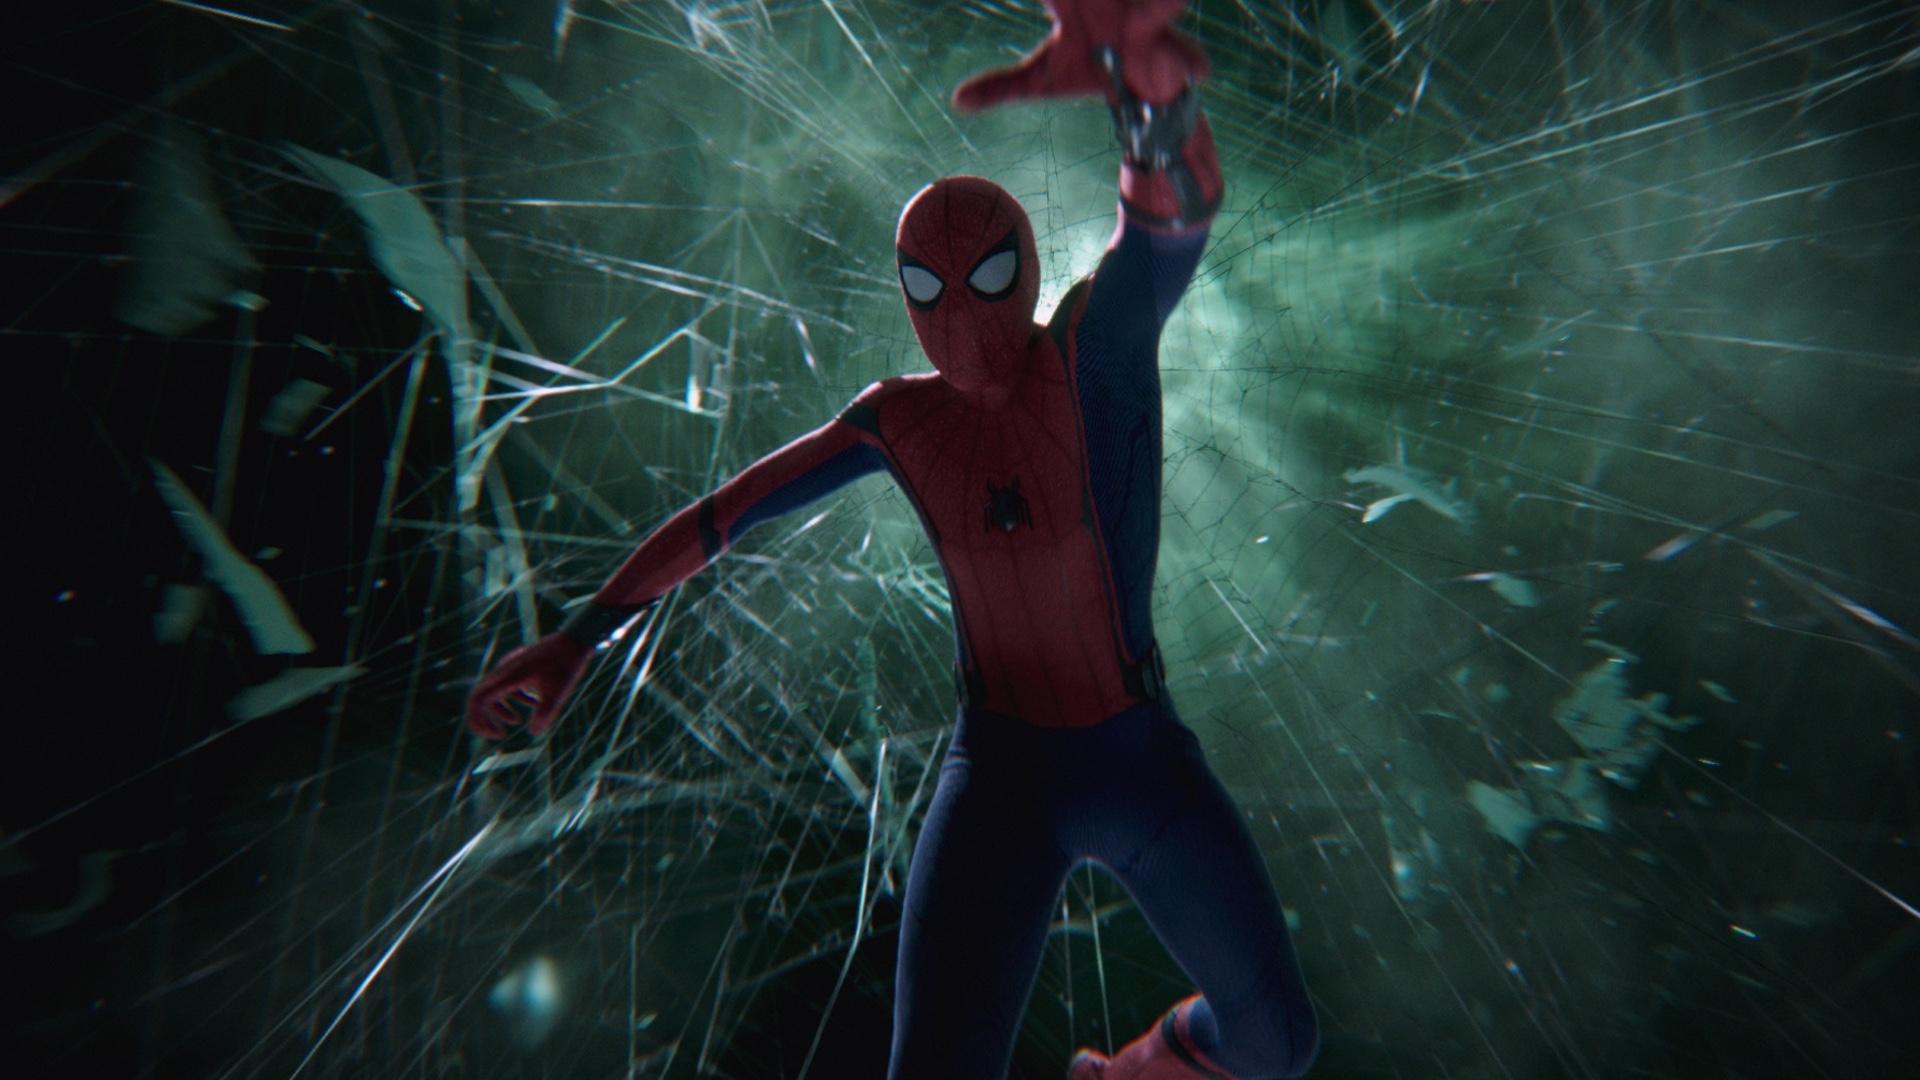 Wallpaper Spider Man Far From Home Tom Holland Spider Man